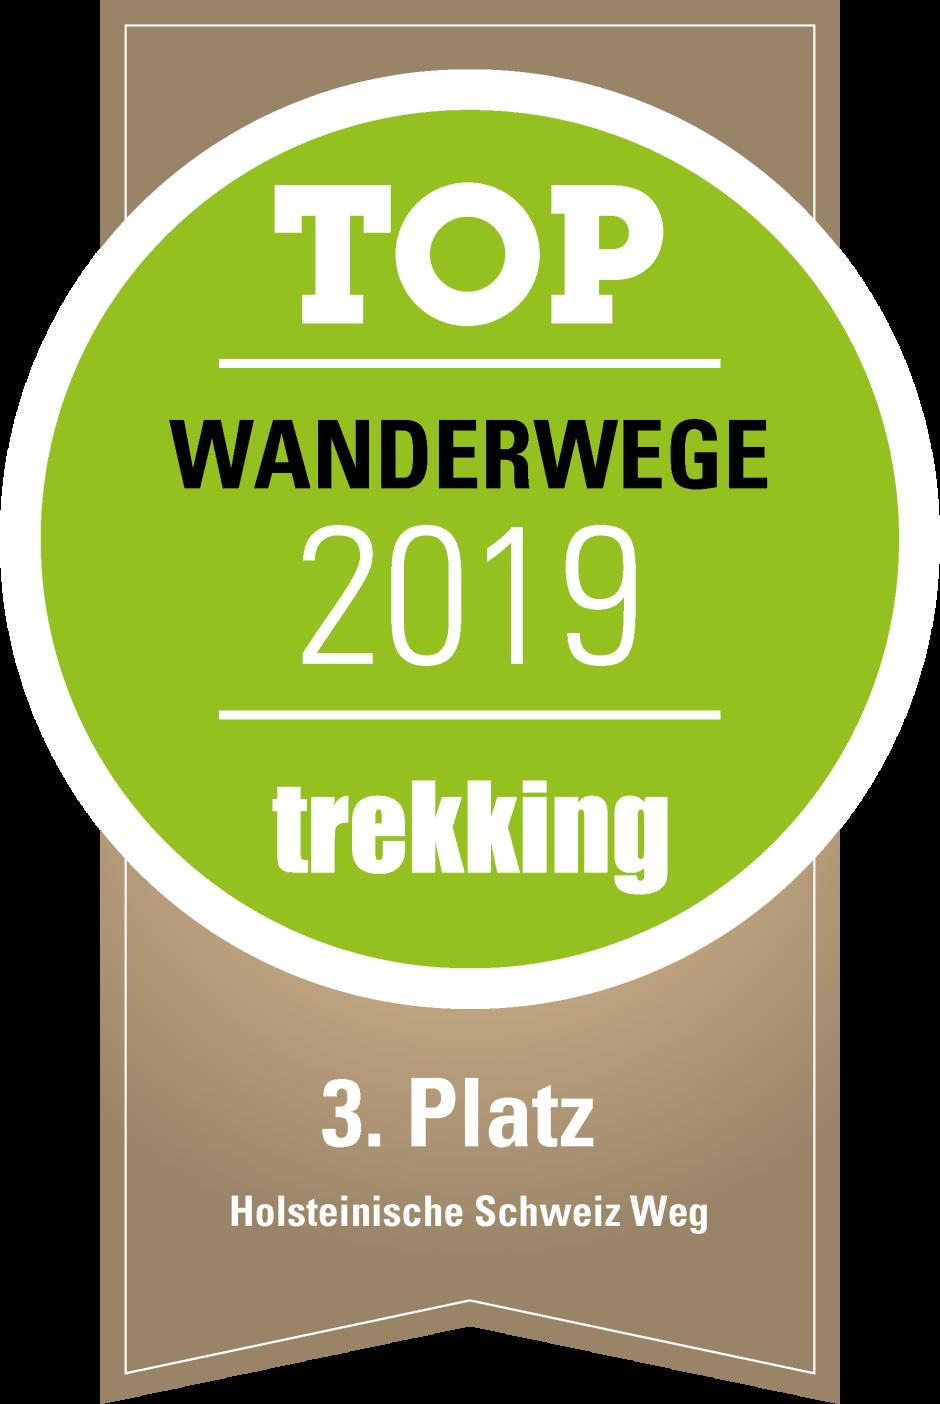 logo siegel trekking 3 Platz Wanderwege Holsteinische Schweiz Weg 940x1404 Holsteinische Schweiz Weg erhält Trekking Award